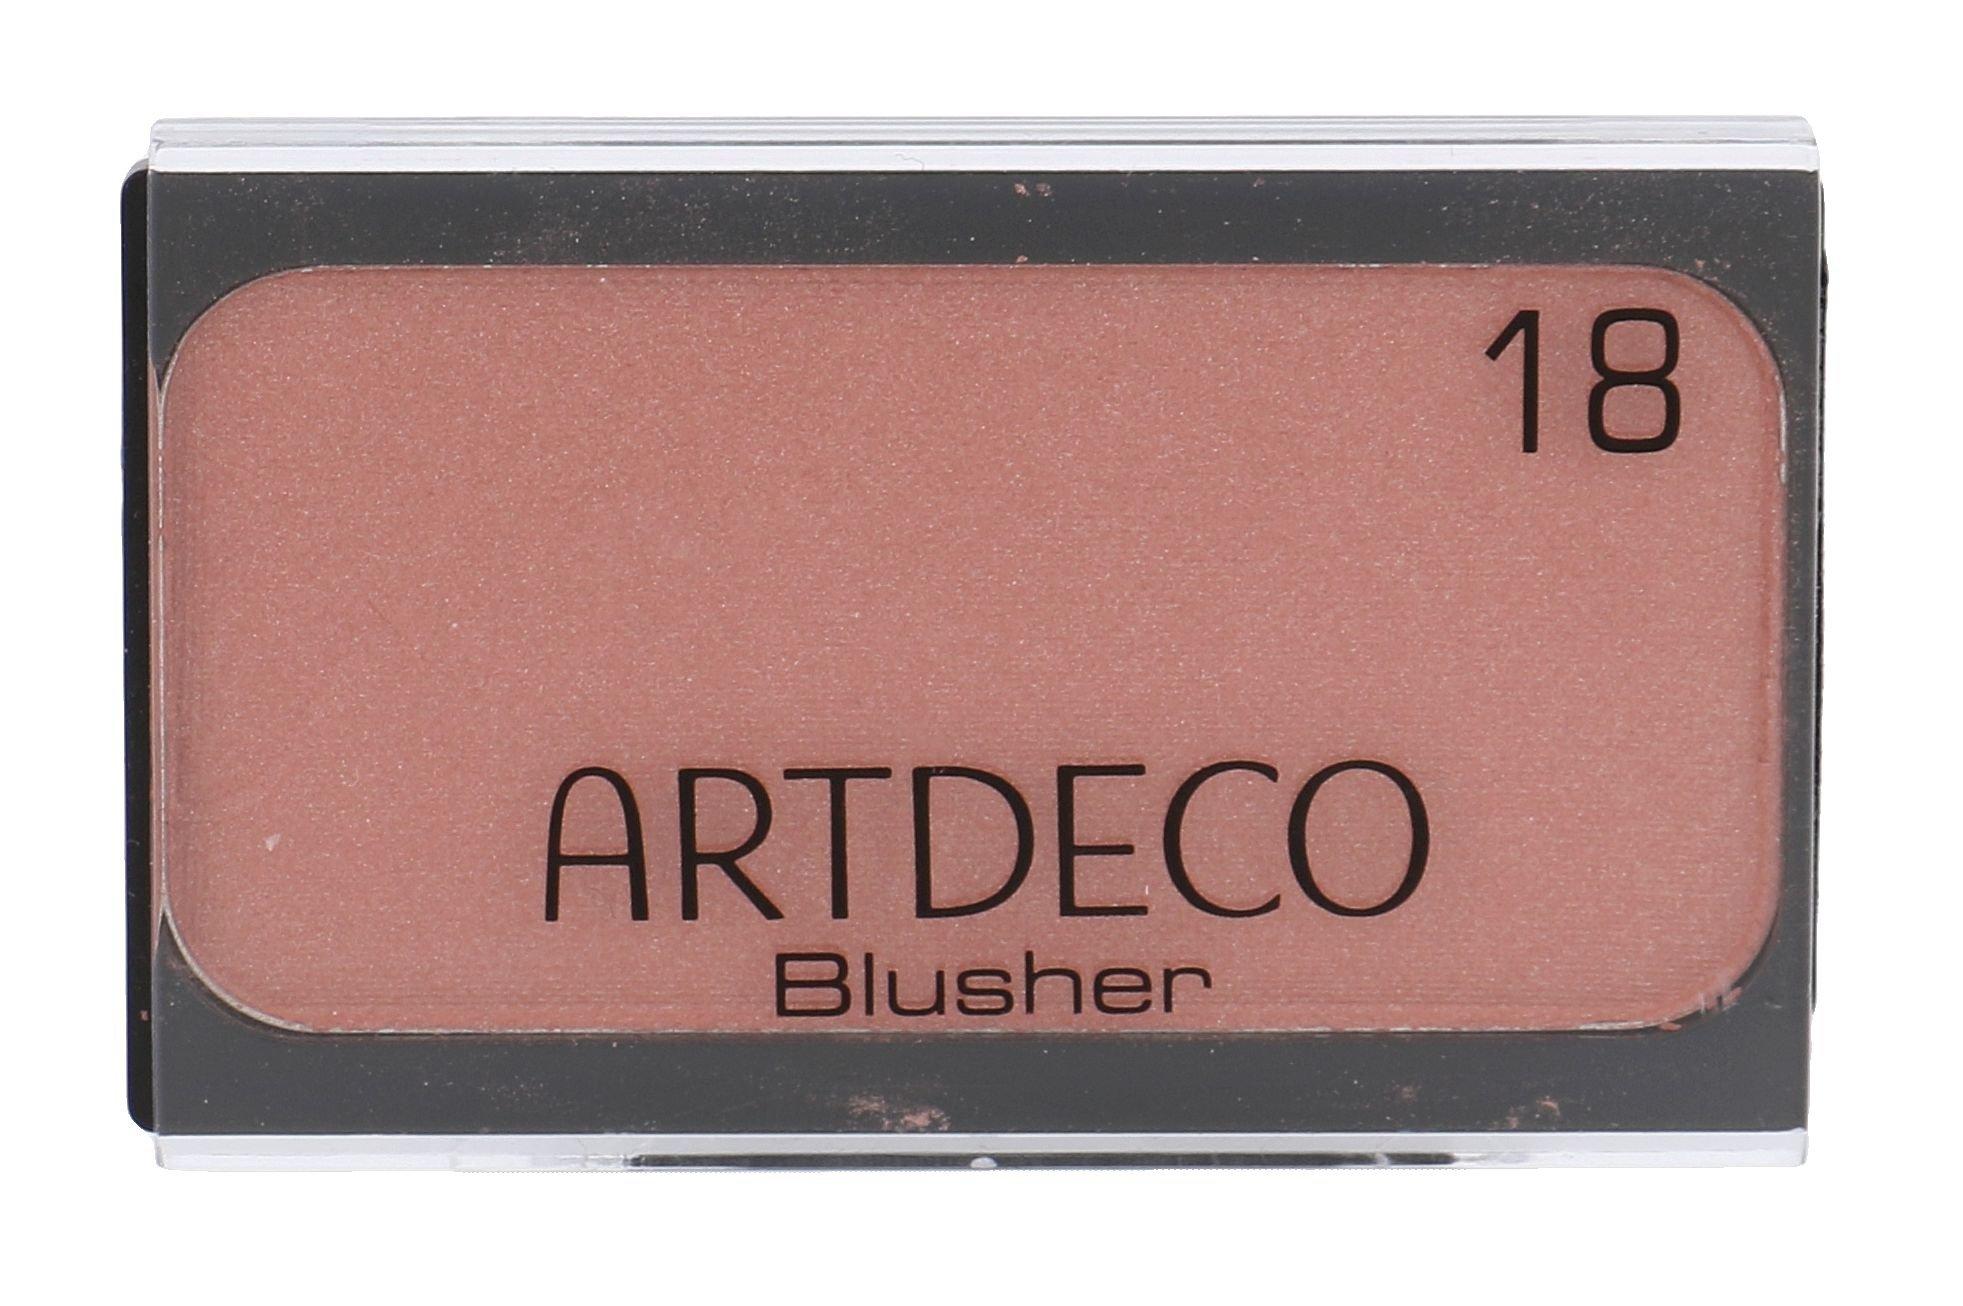 Artdeco Blusher Cosmetic 5ml 18 Beige Rose Blush